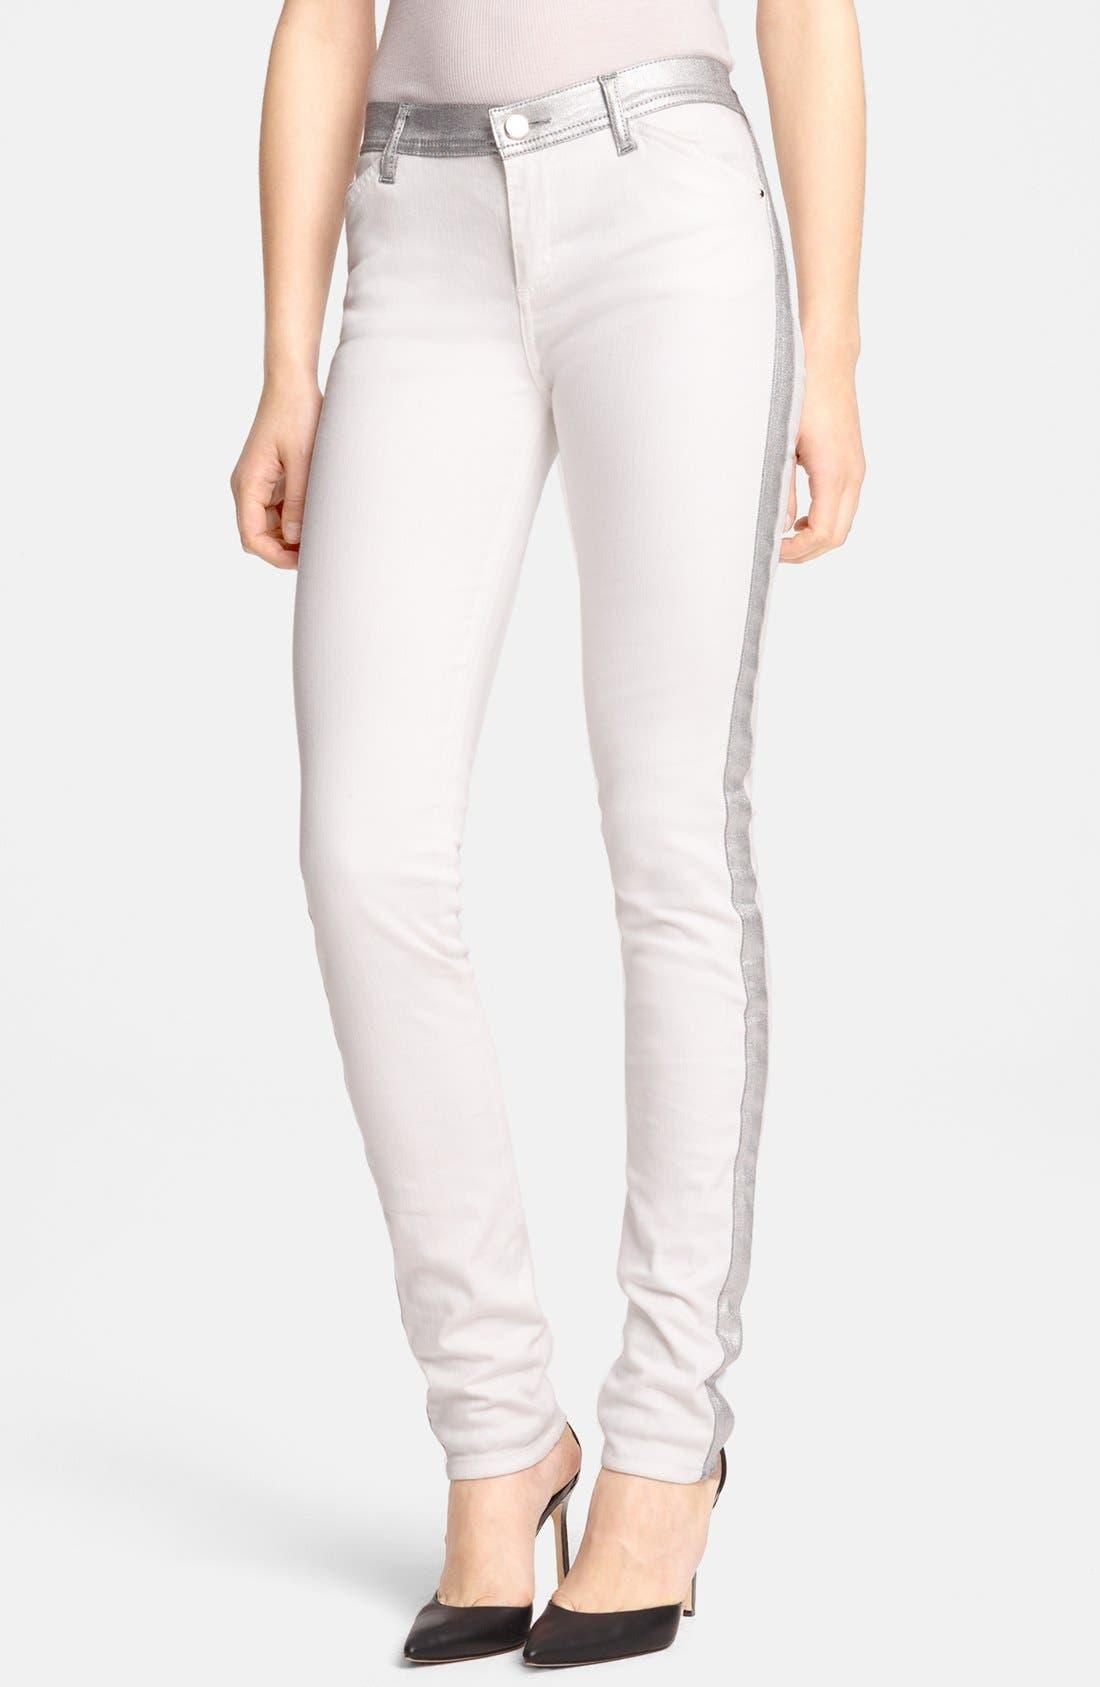 Alternate Image 1 Selected - Faith Connexion Metallic Trim Skinny Jeans